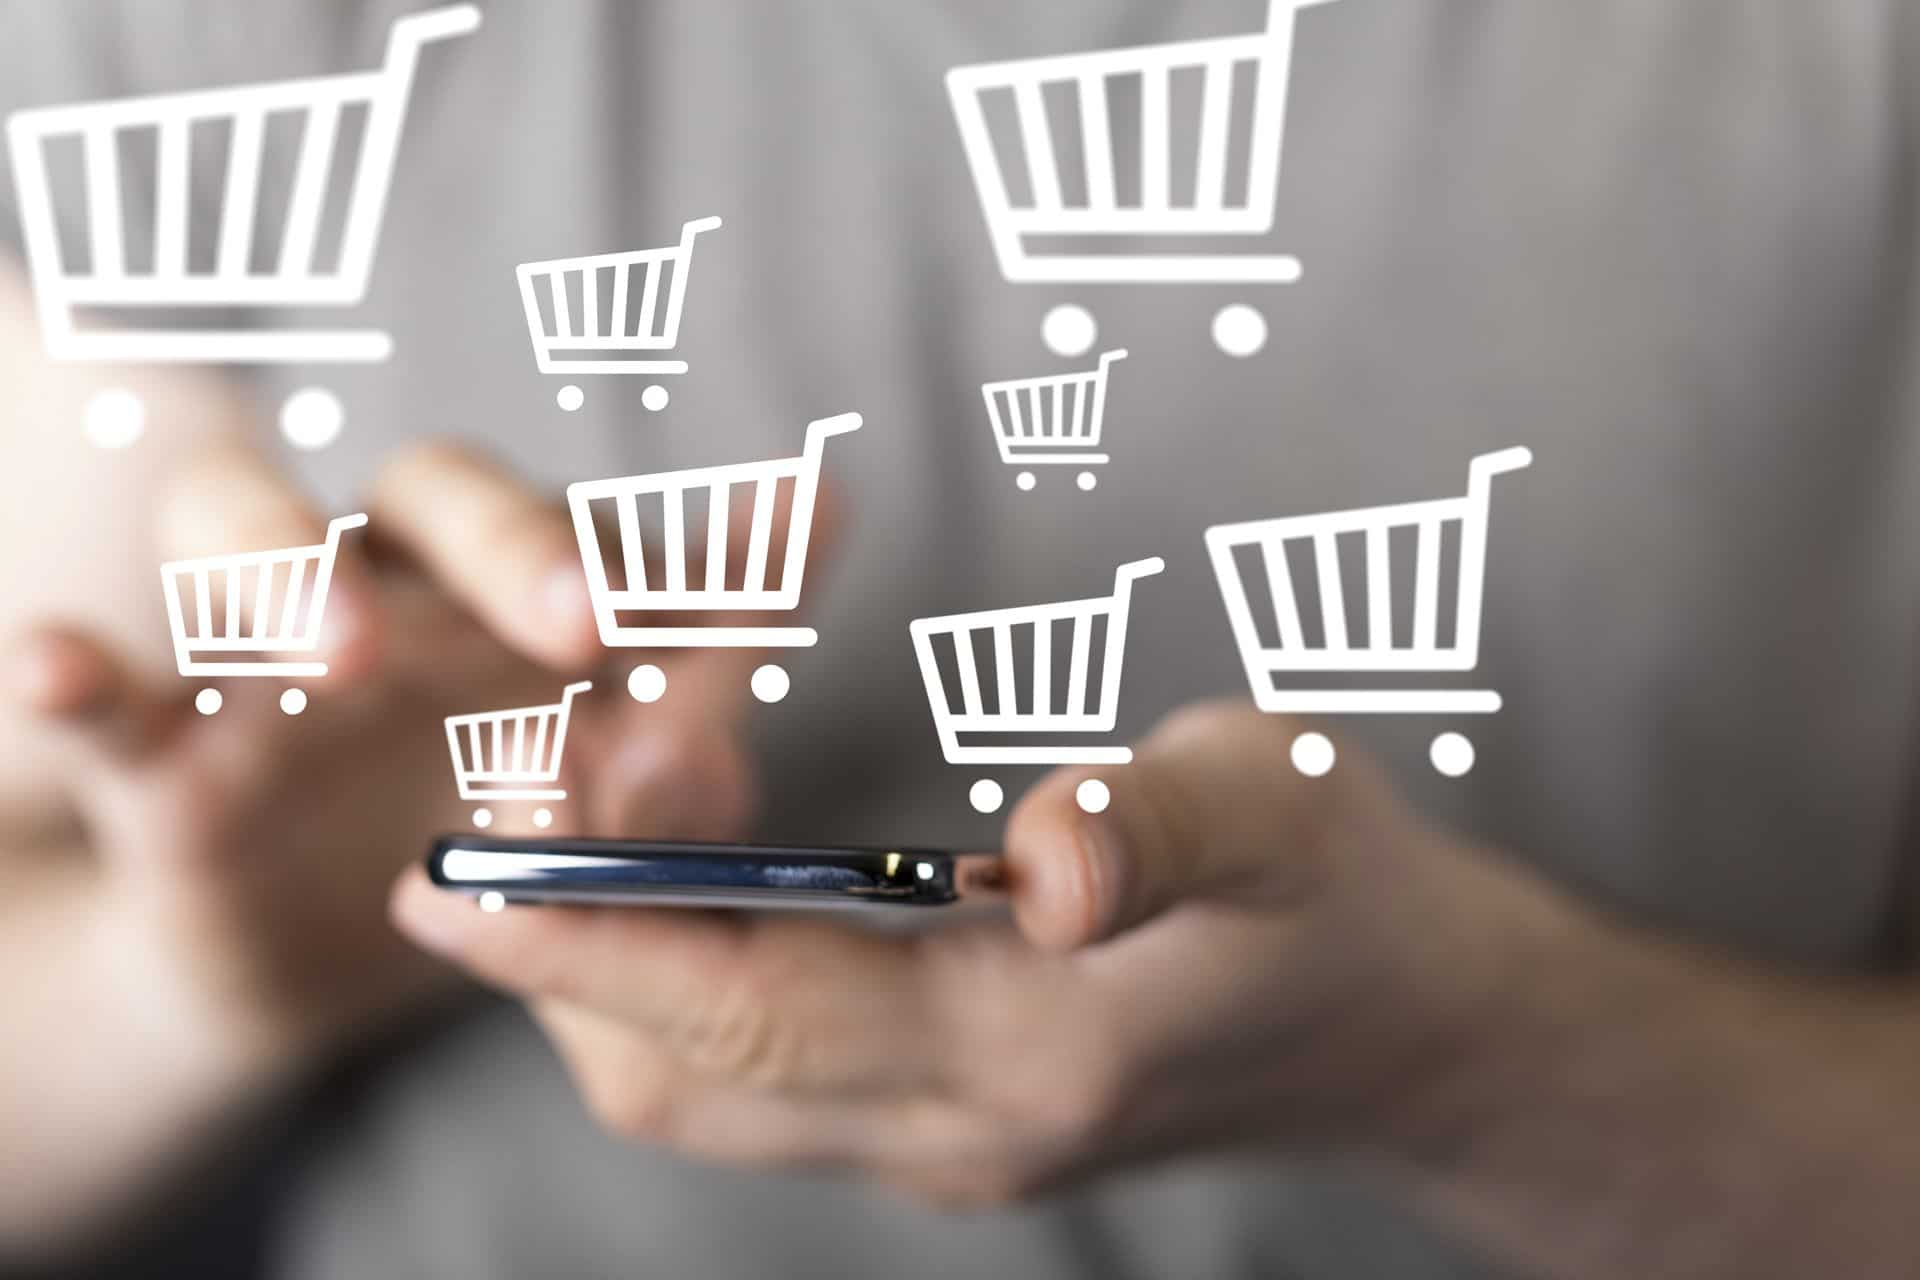 Desarrollo de tiendas online en Esplugues de Llobregat con Prestashop o Woocommerce